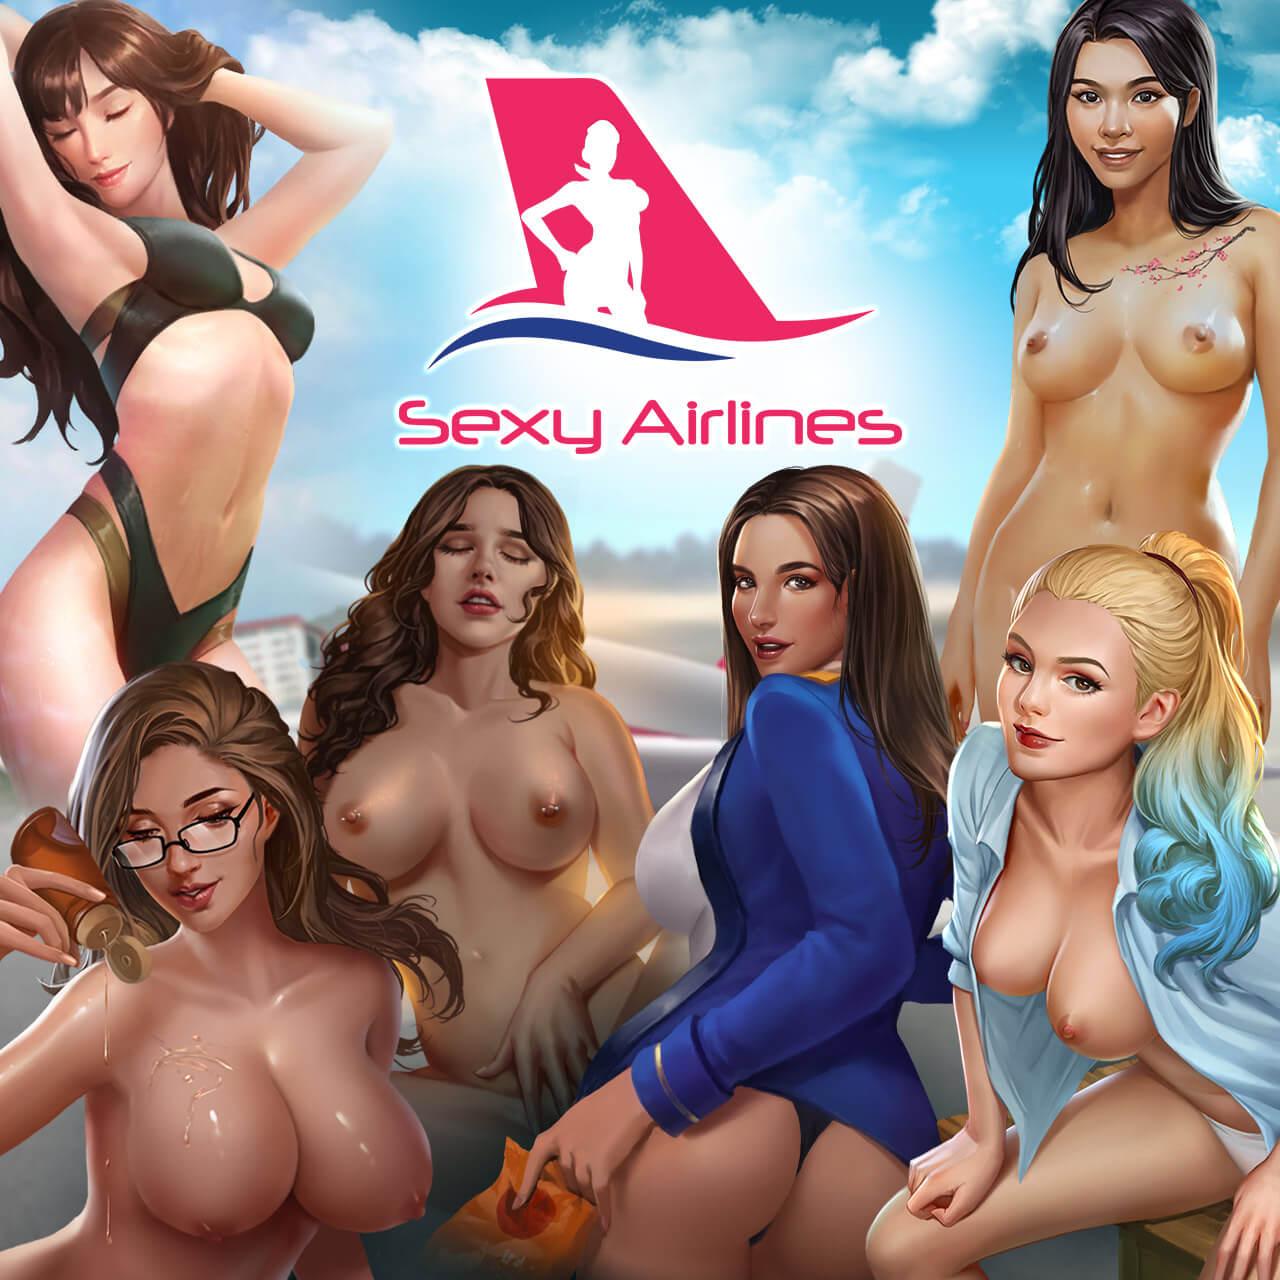 Stewardess sex free gallery jpg